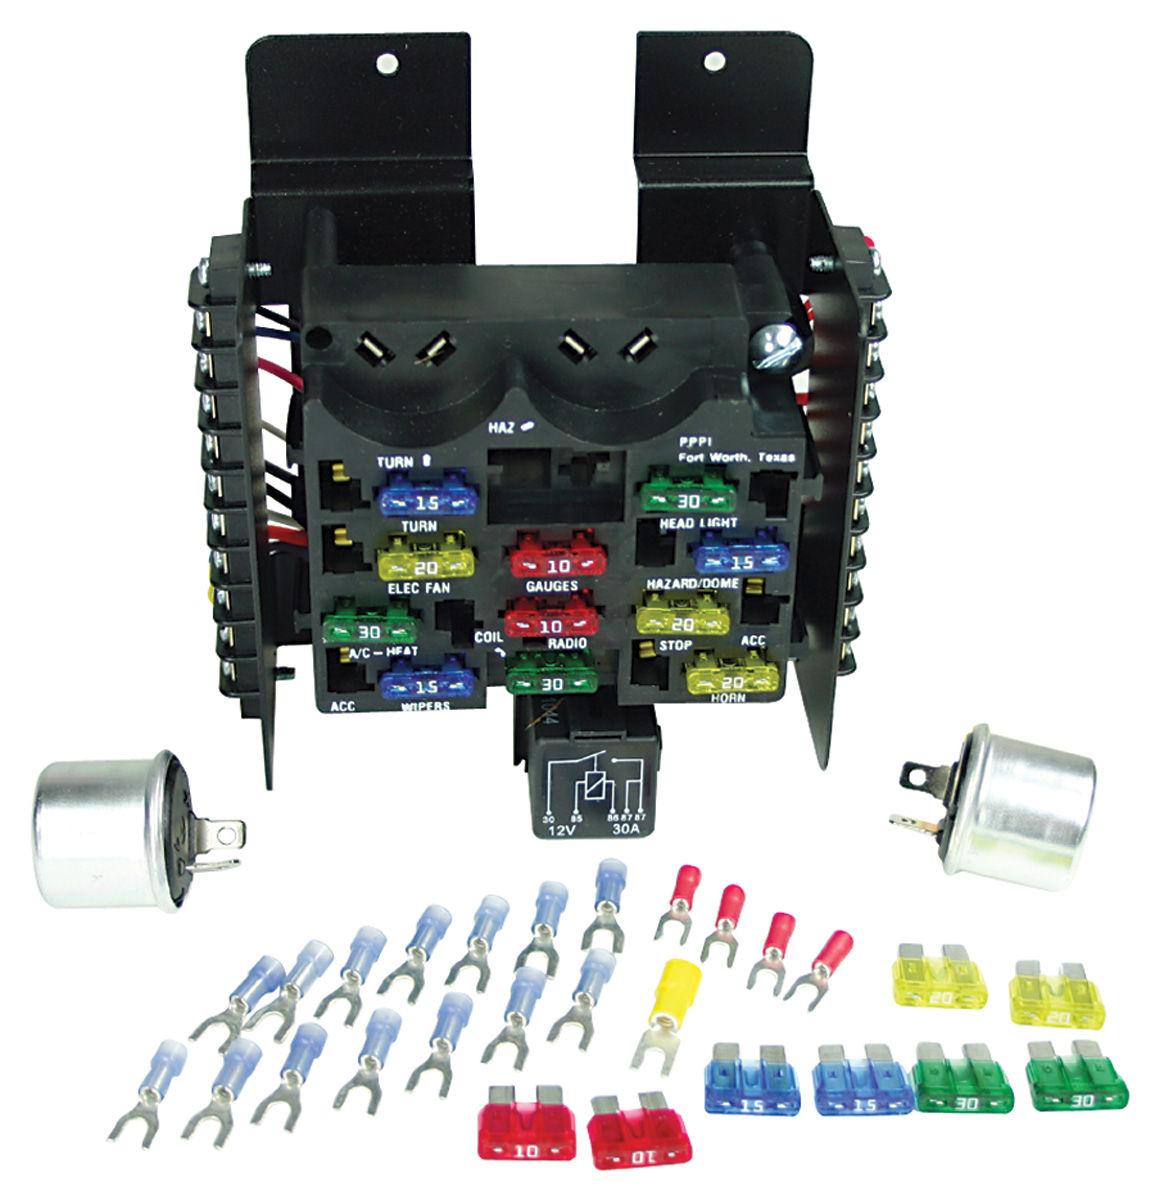 1966 vw bus wiring diagram for pioneer radio painless performance 1961-72 gto circuit fuse block 14-circuit @ opgi.com